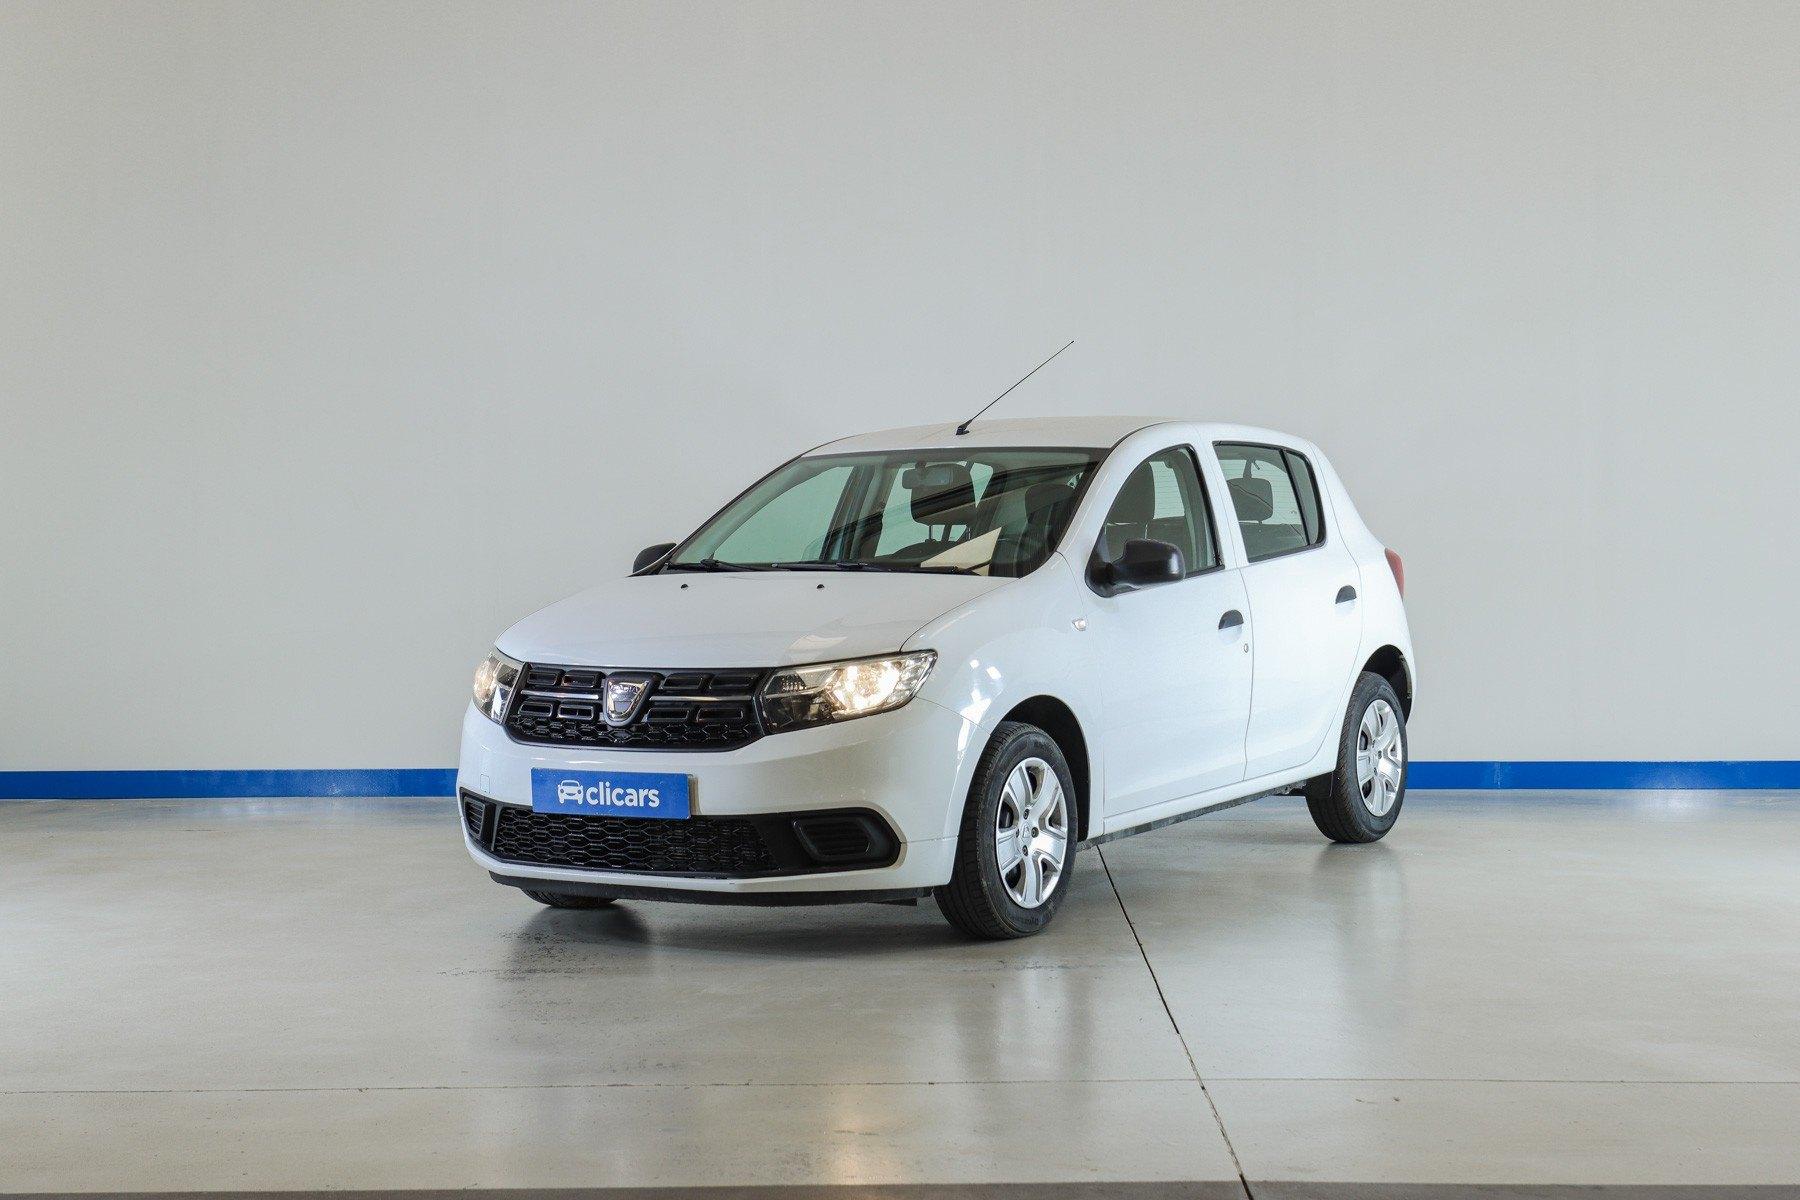 Dacia Sandero Gas licuado Ambiance TCE 66kW (90CV) GLP 1